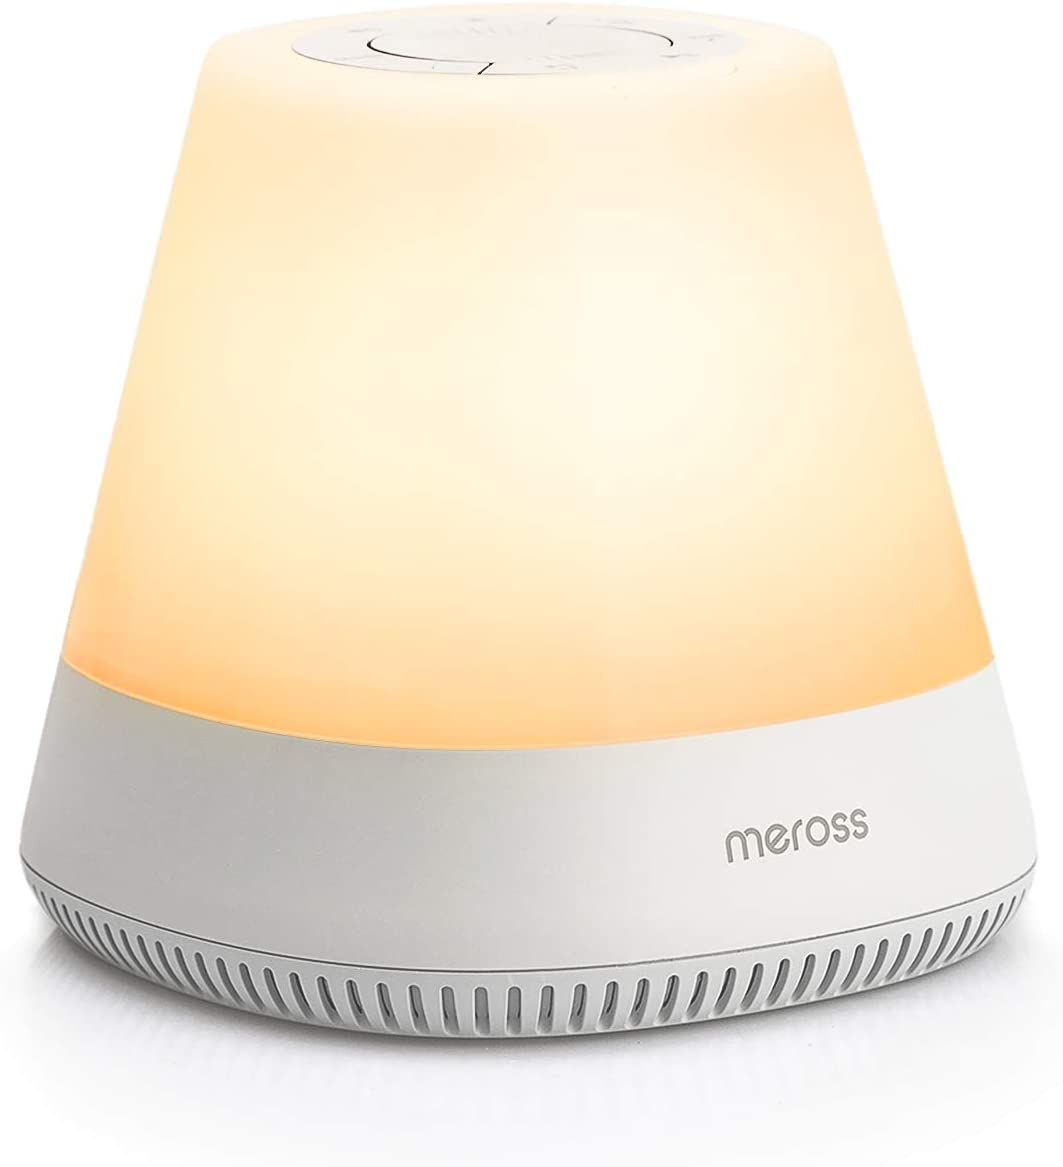 Meross Smart Baby Rest Night Light, Nursery Sound Machine, Toddler Sleep Trainer, Works with Alexa and Google Assistant